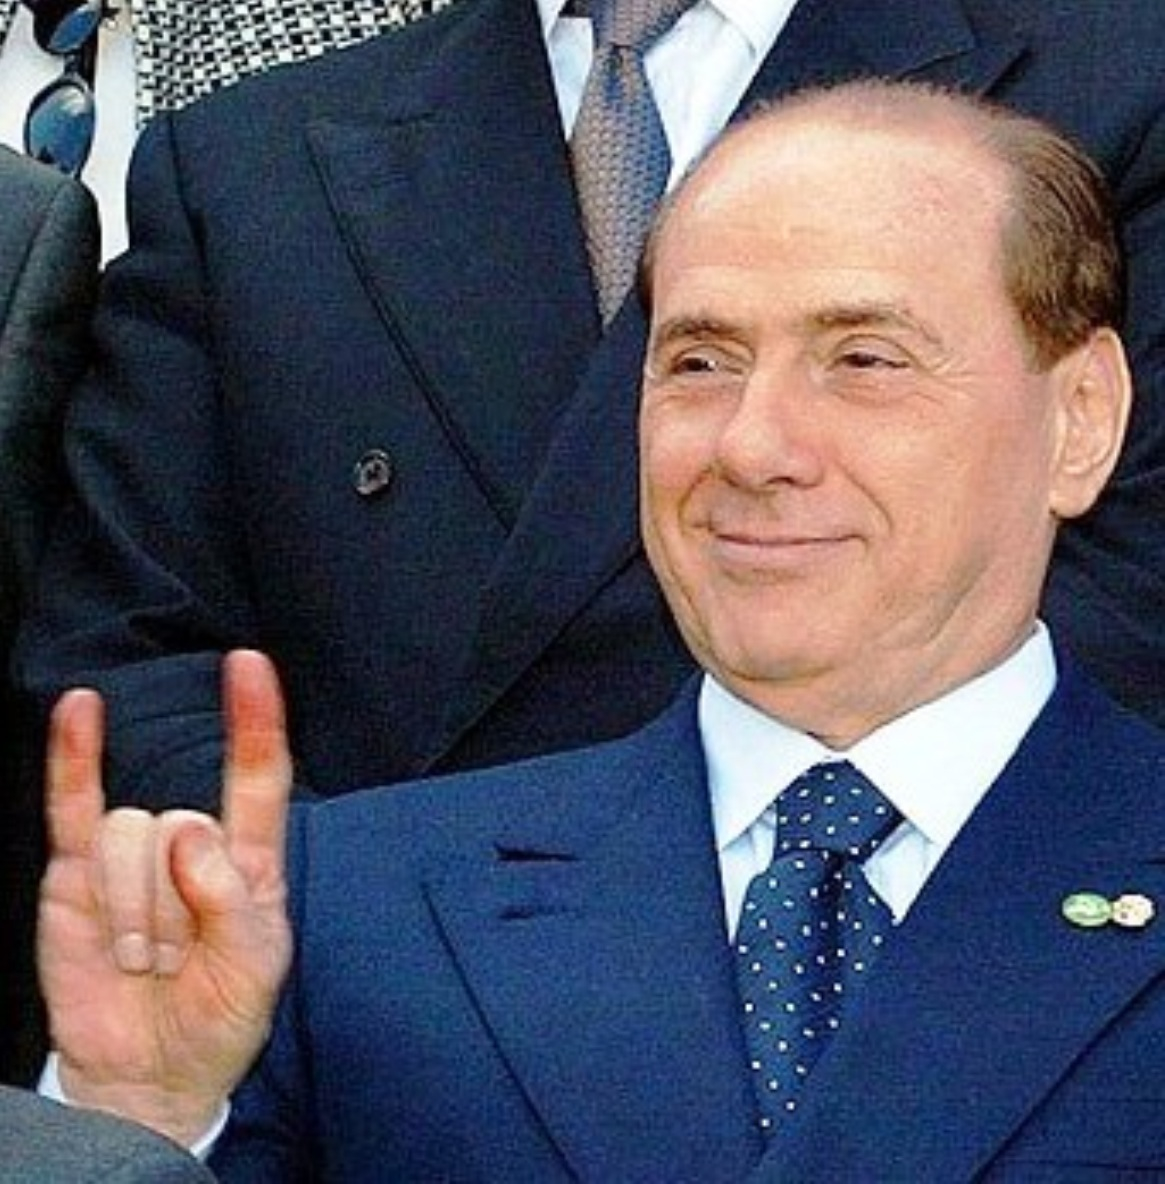 https://i2.wp.com/www.giornalettismo.com/wp-content/uploads/2012/12/scandali-di-berlusconi26.jpg